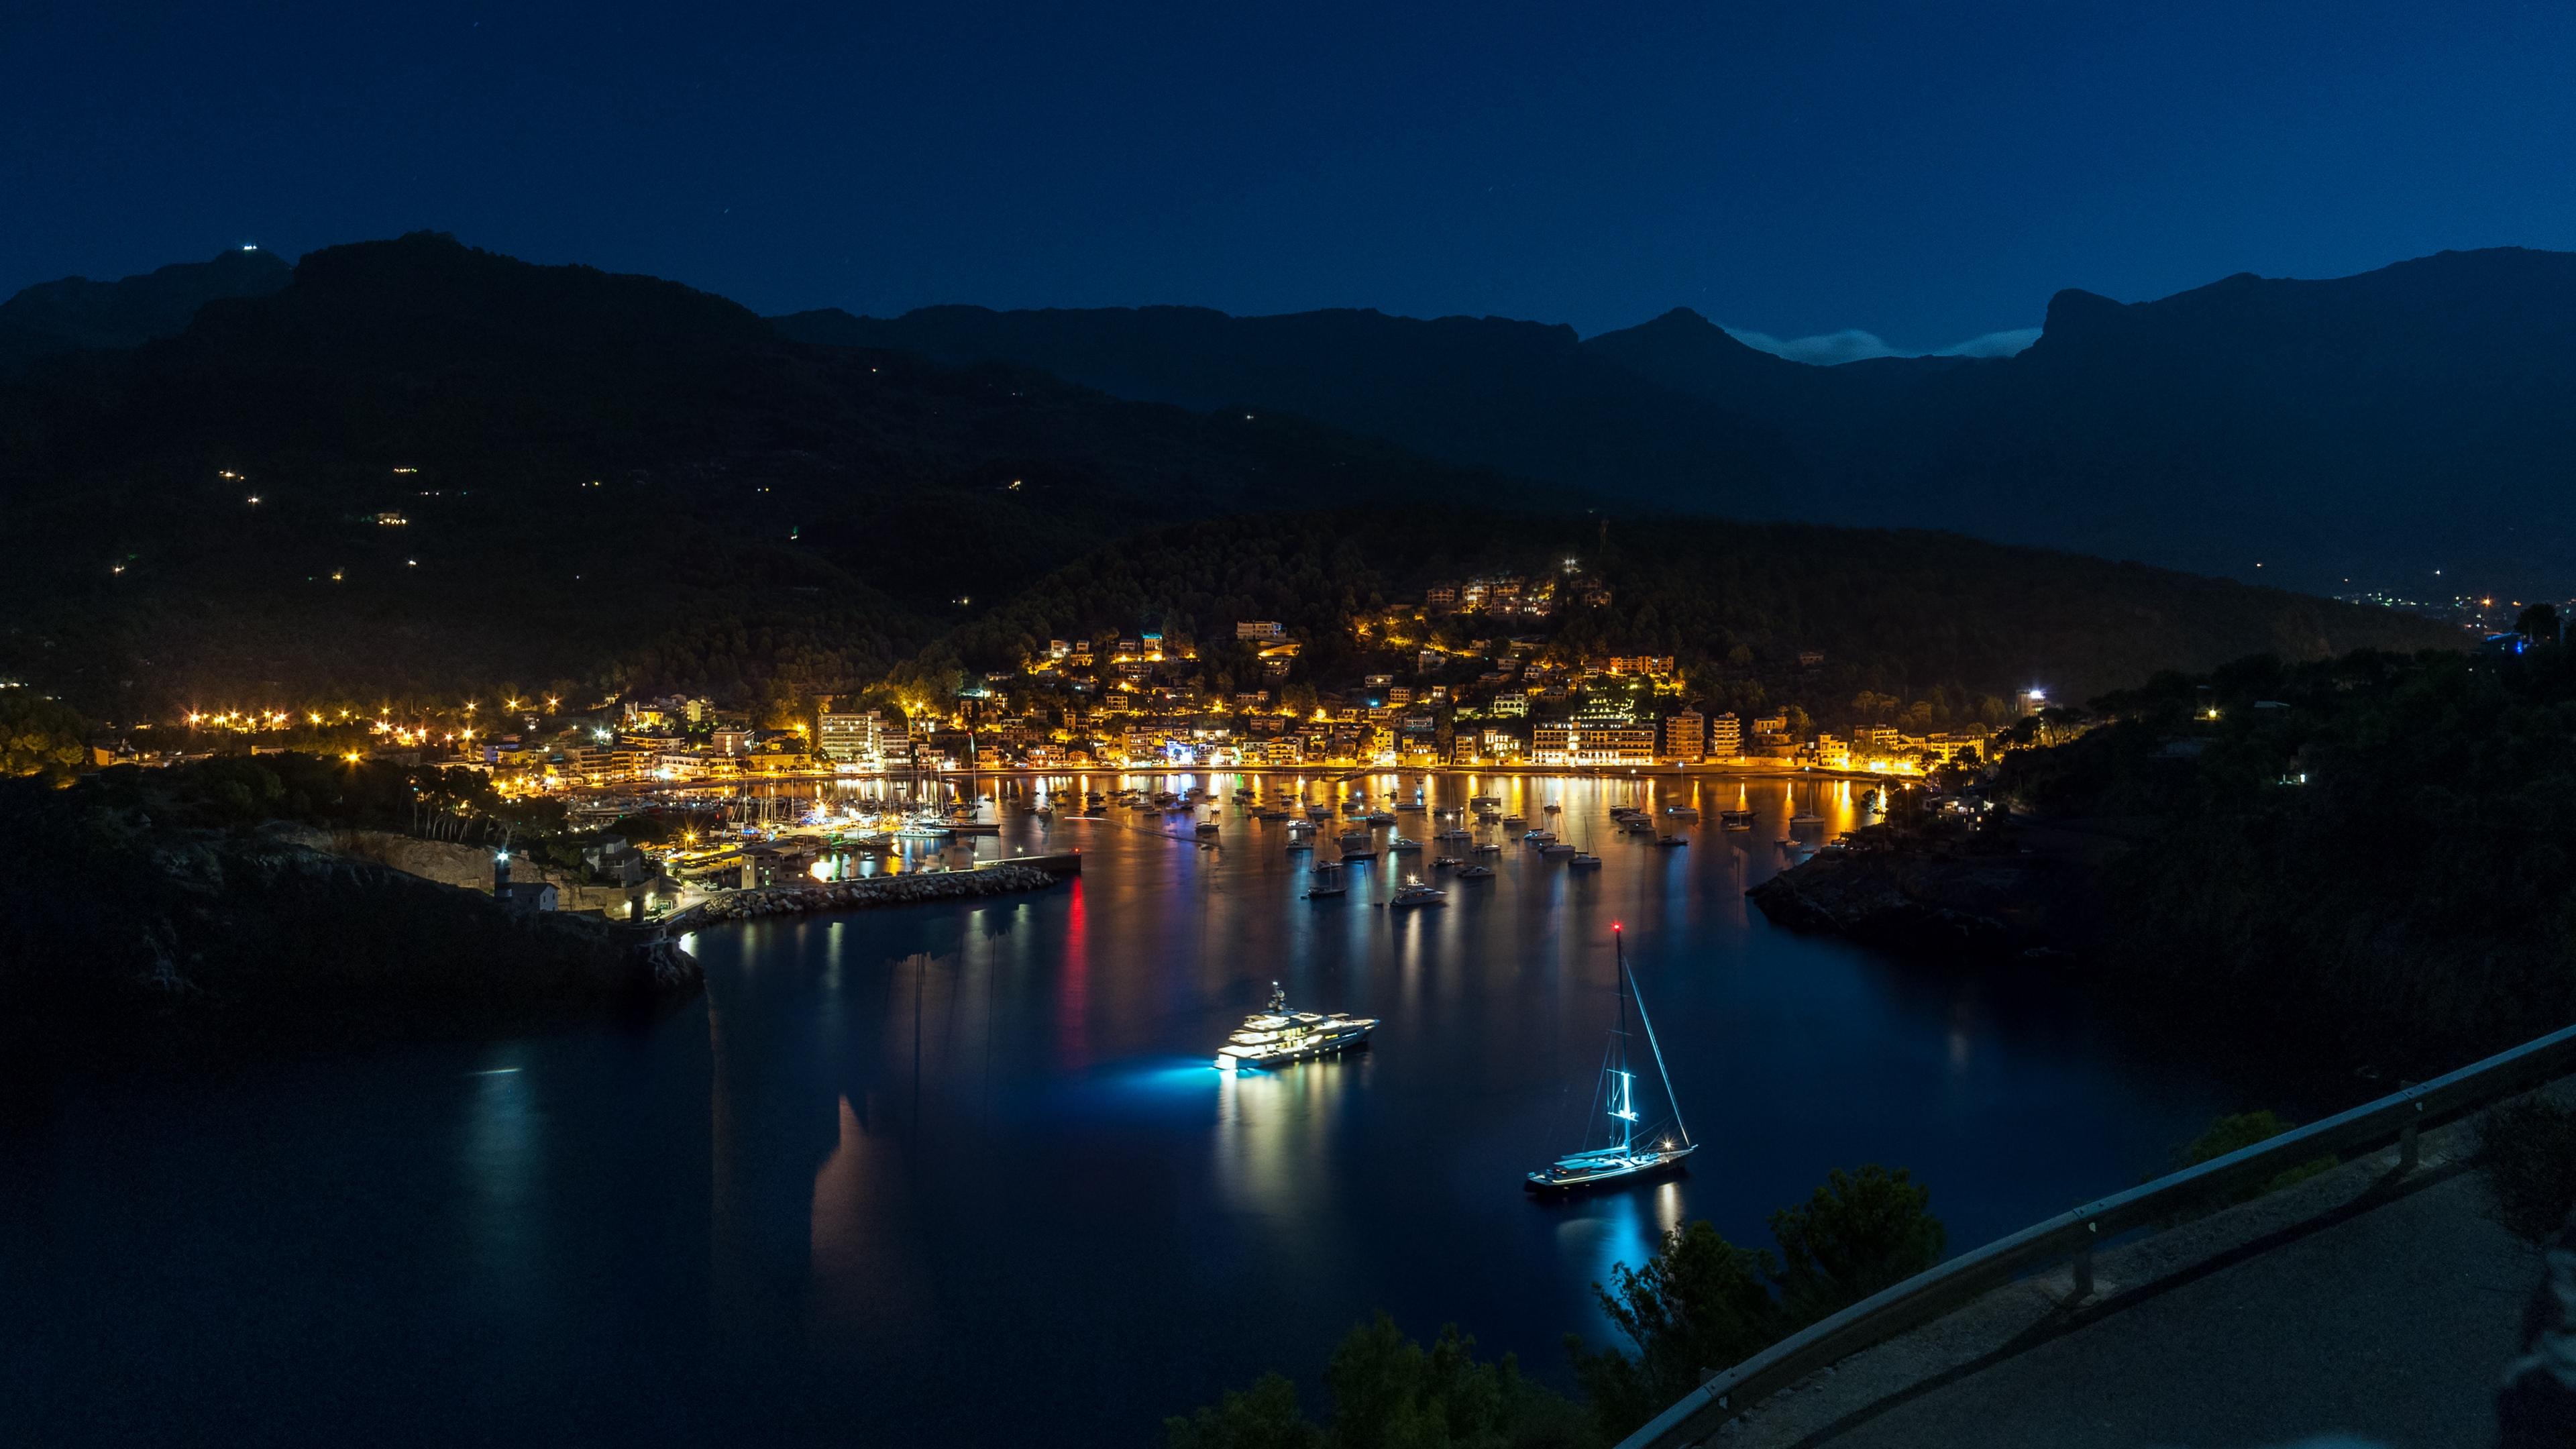 majorca spain night shore 4k 1538068499 - majorca, spain, night, shore 4k - Spain, Night, majorca